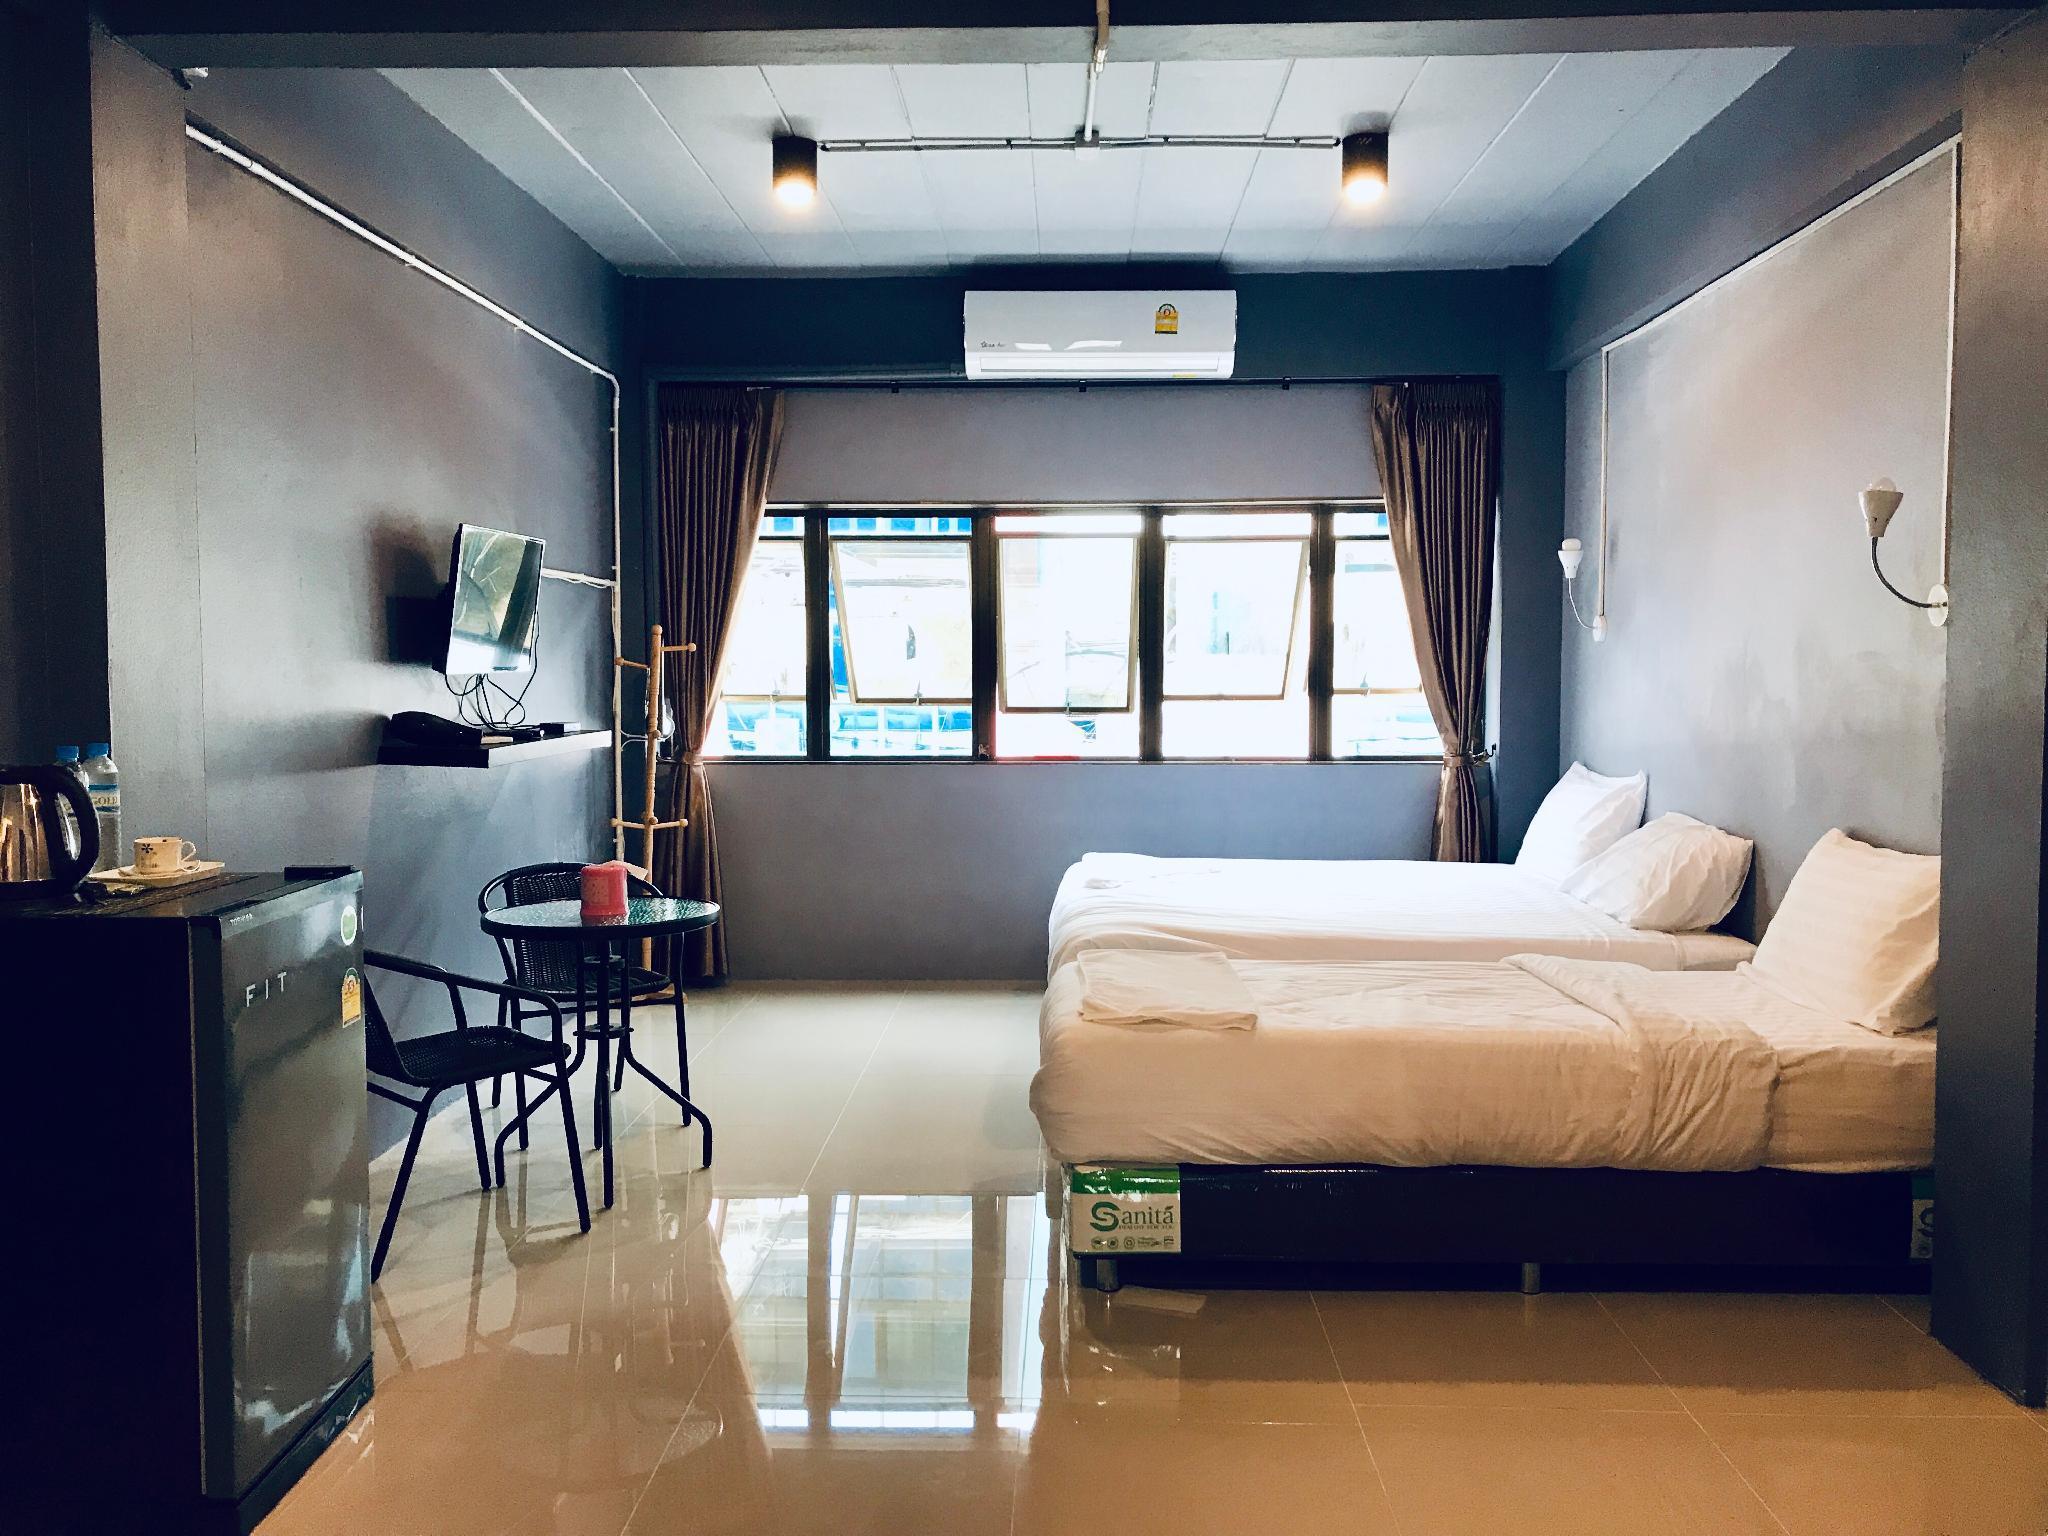 SleepCats Hostel